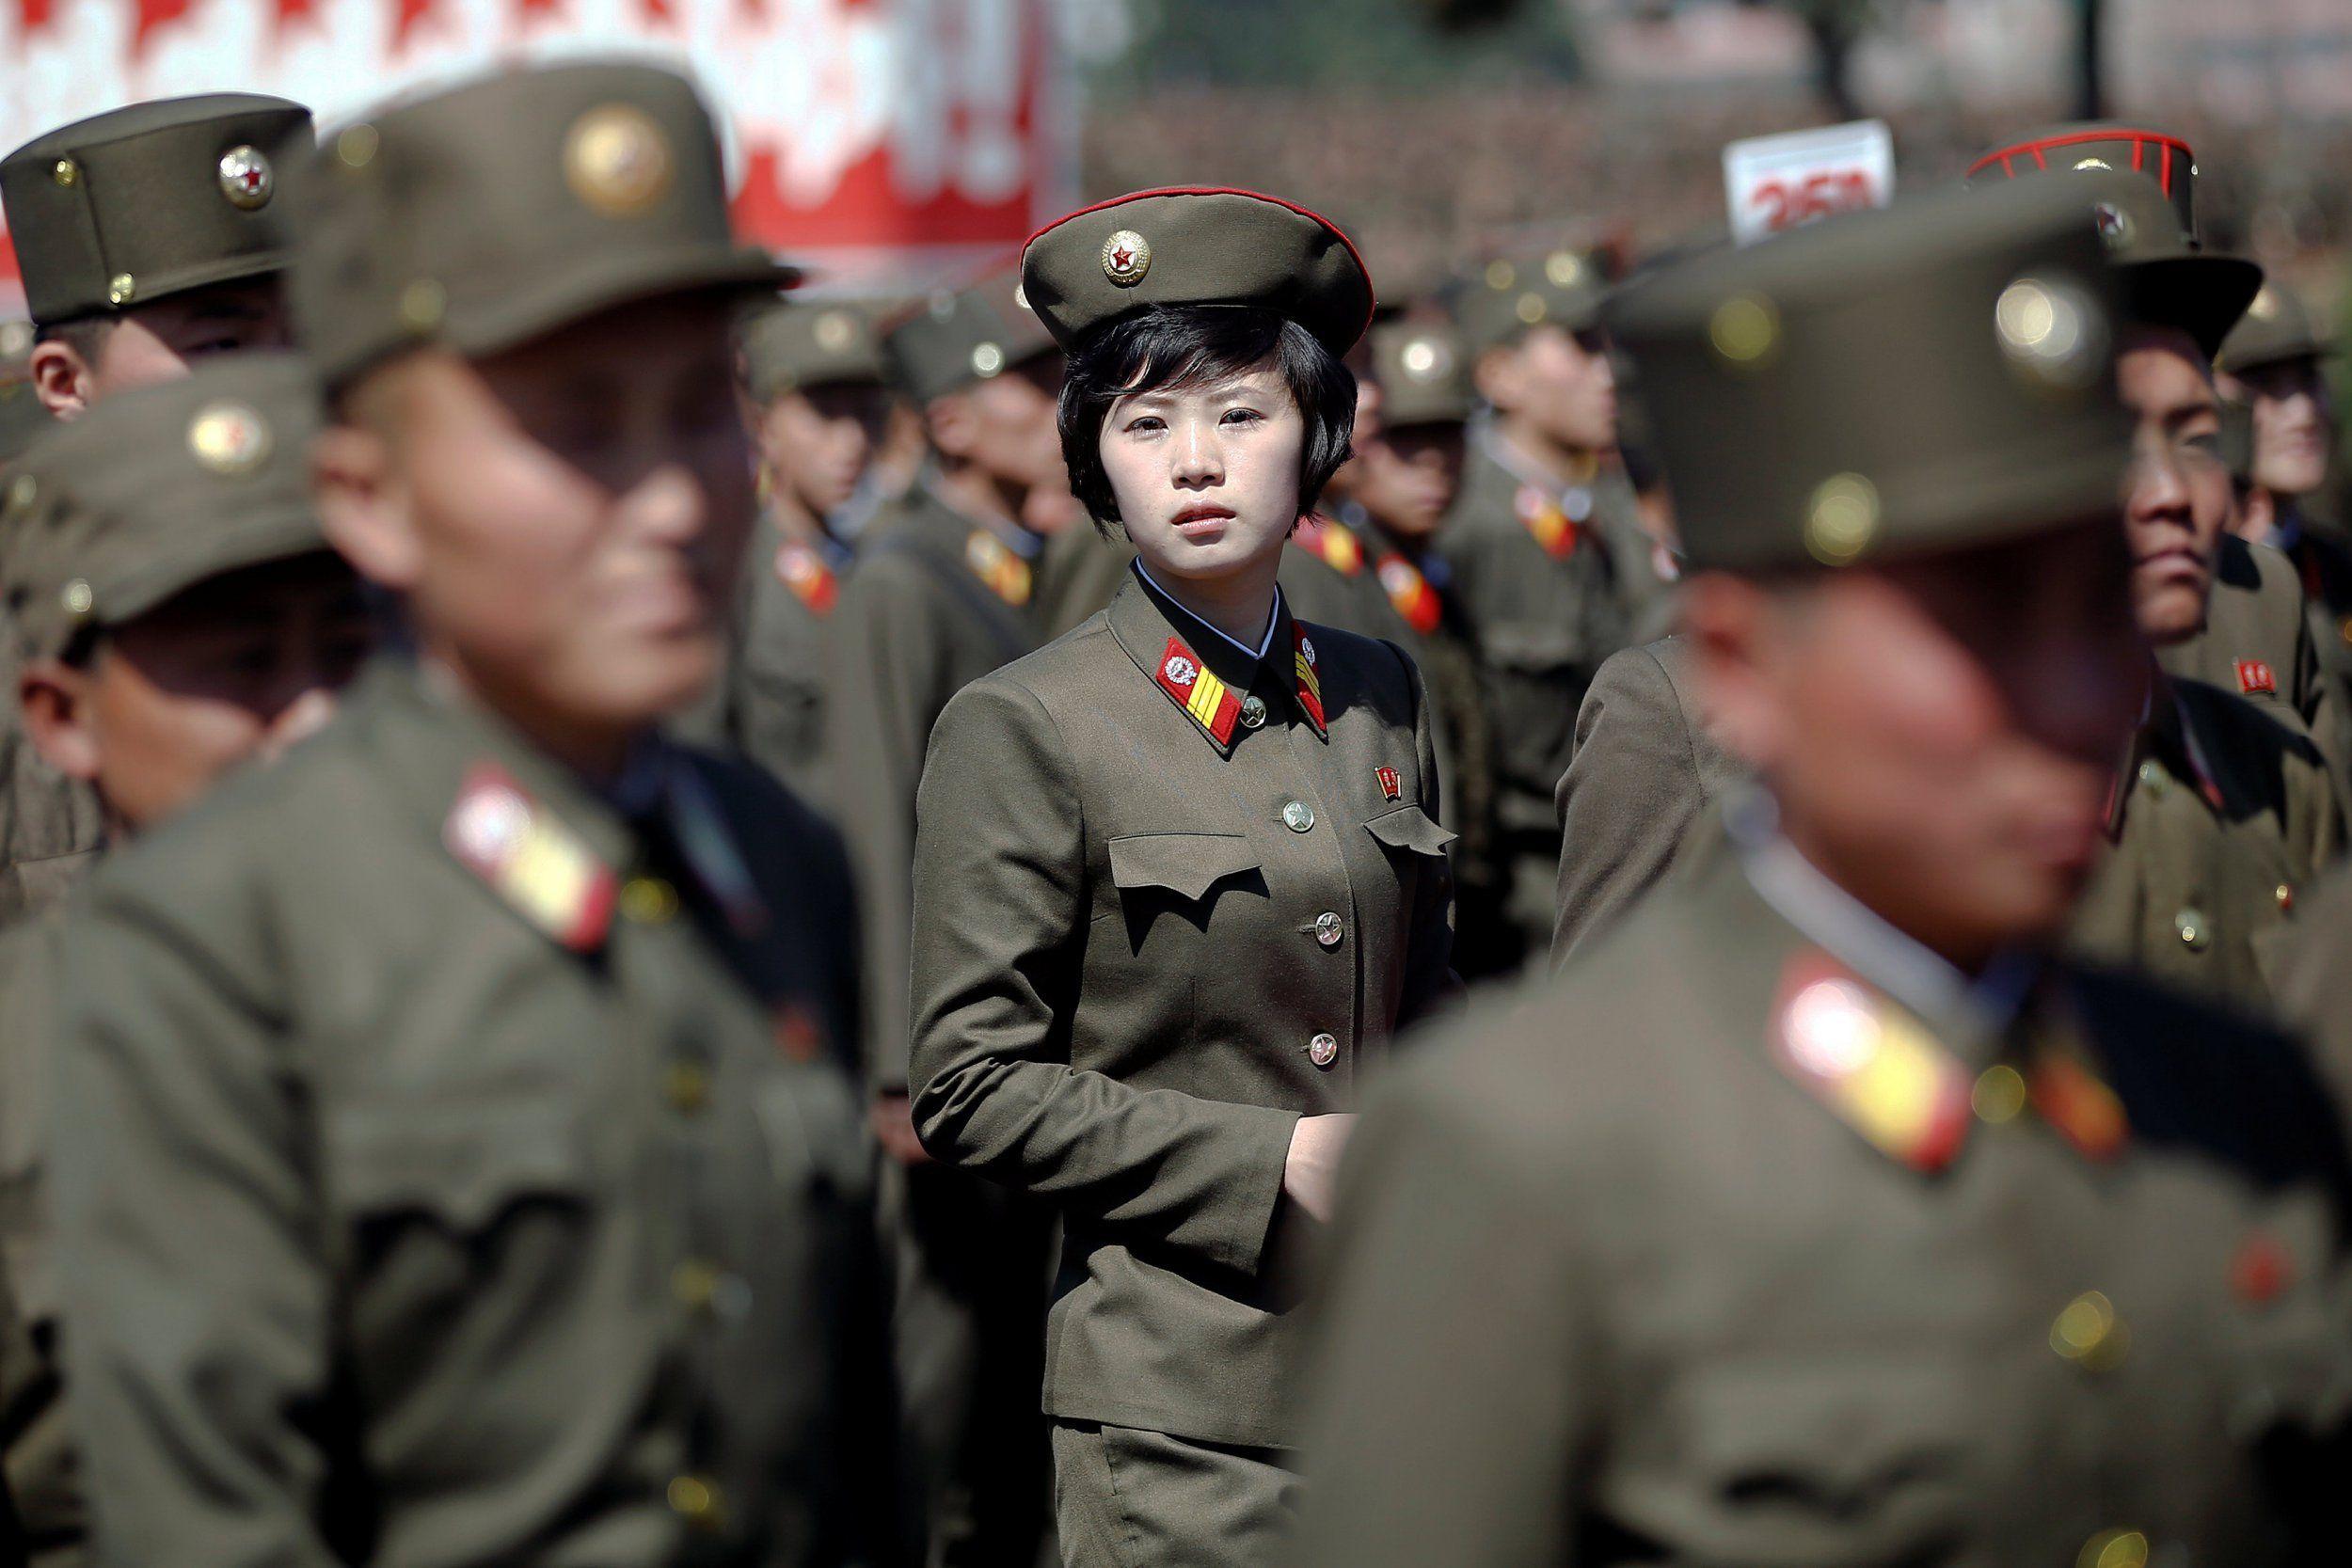 Macintosh HD:Users:brittanyloeffler:Downloads:Upwork:North Korea:10-8.jpg